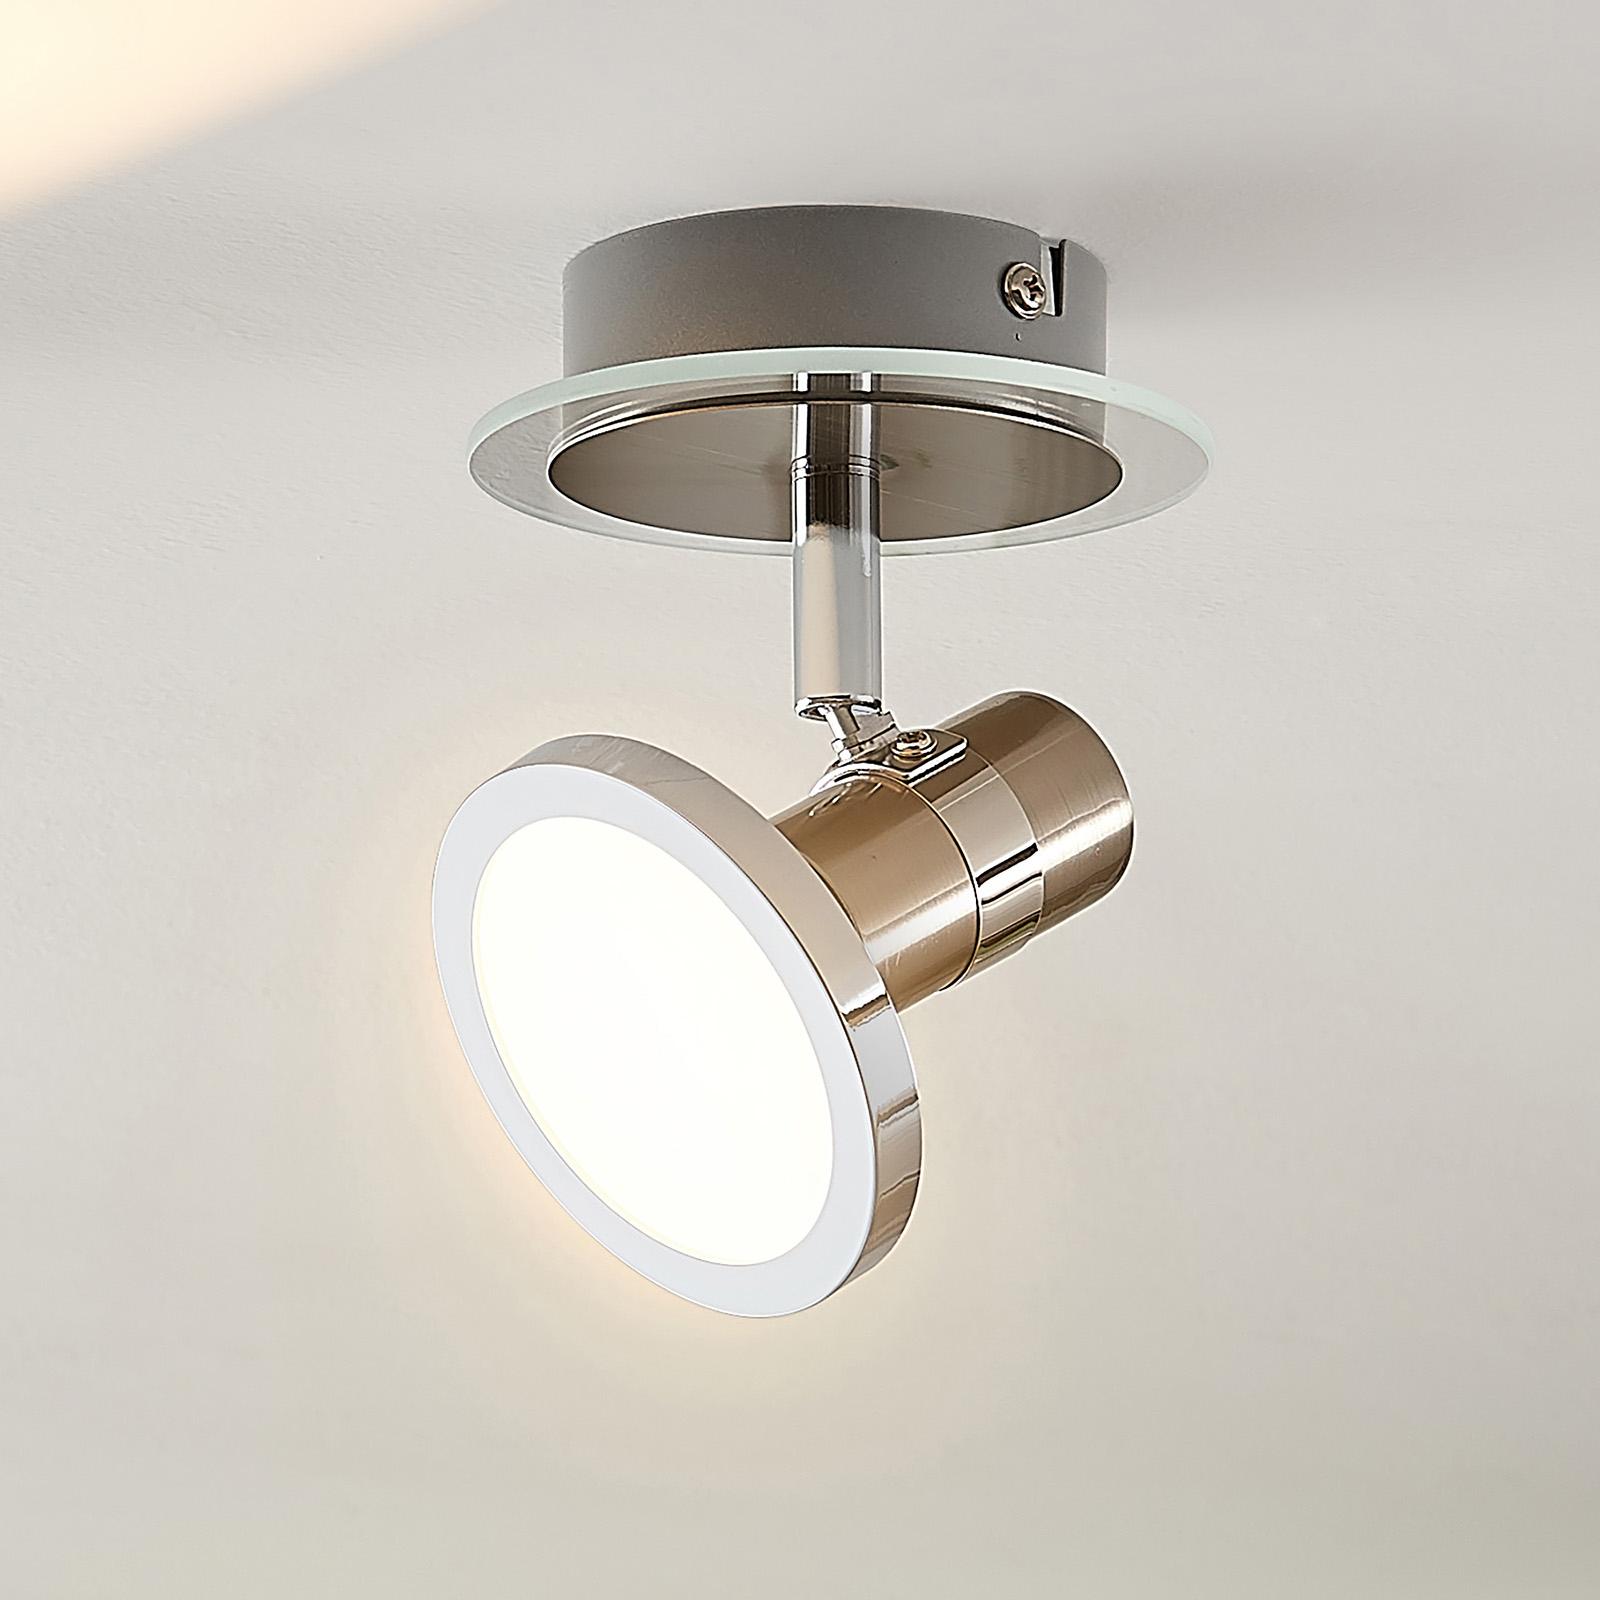 Lindby Kajetan -LED-kohdevalo, nikkeliä, 1-lamp.